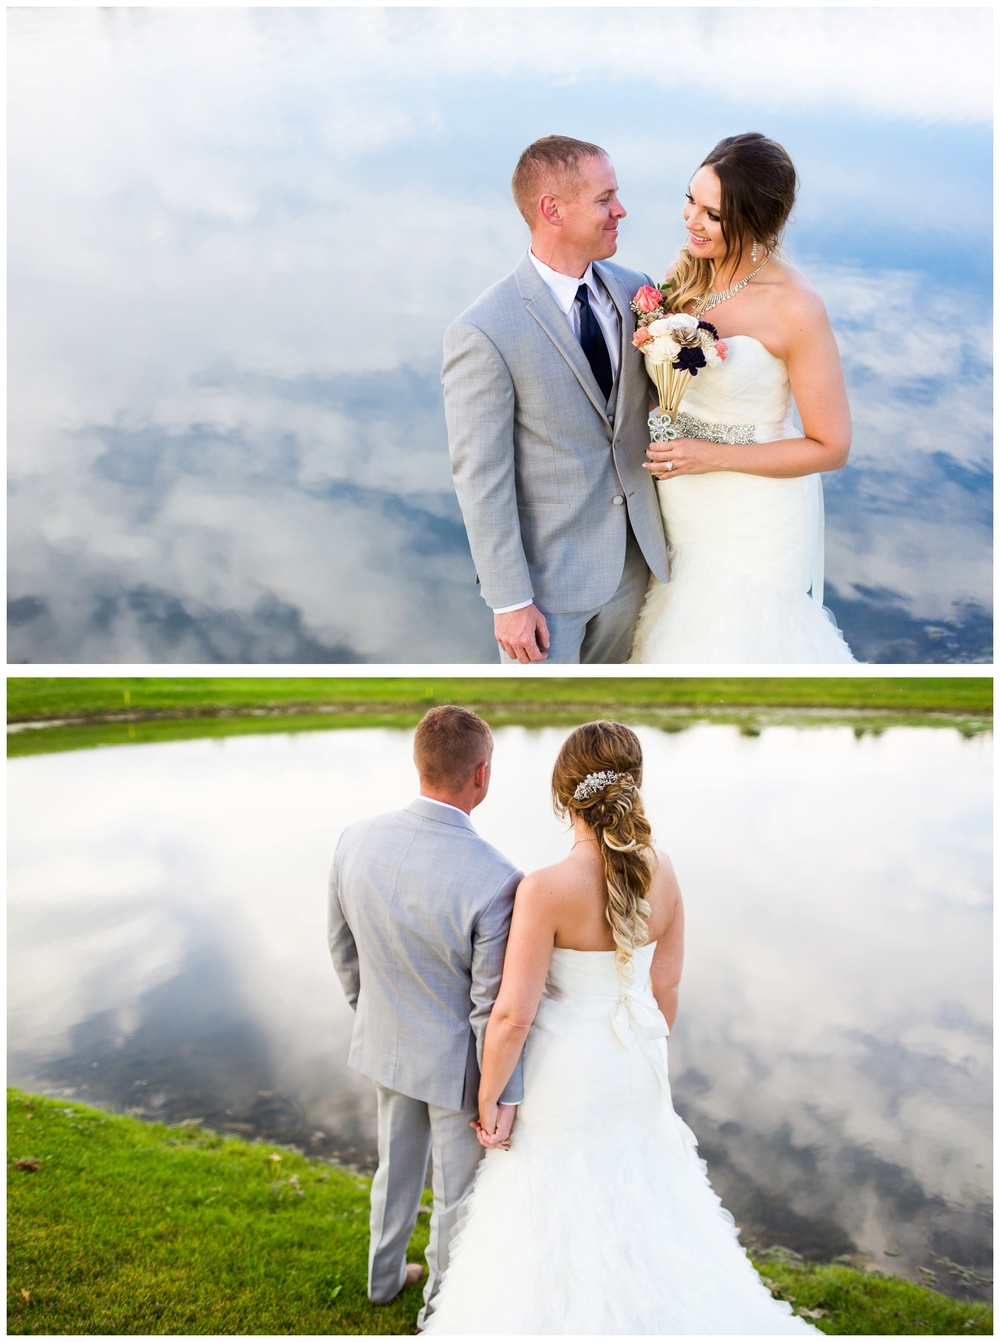 highland meadows wedding photography16.jpg